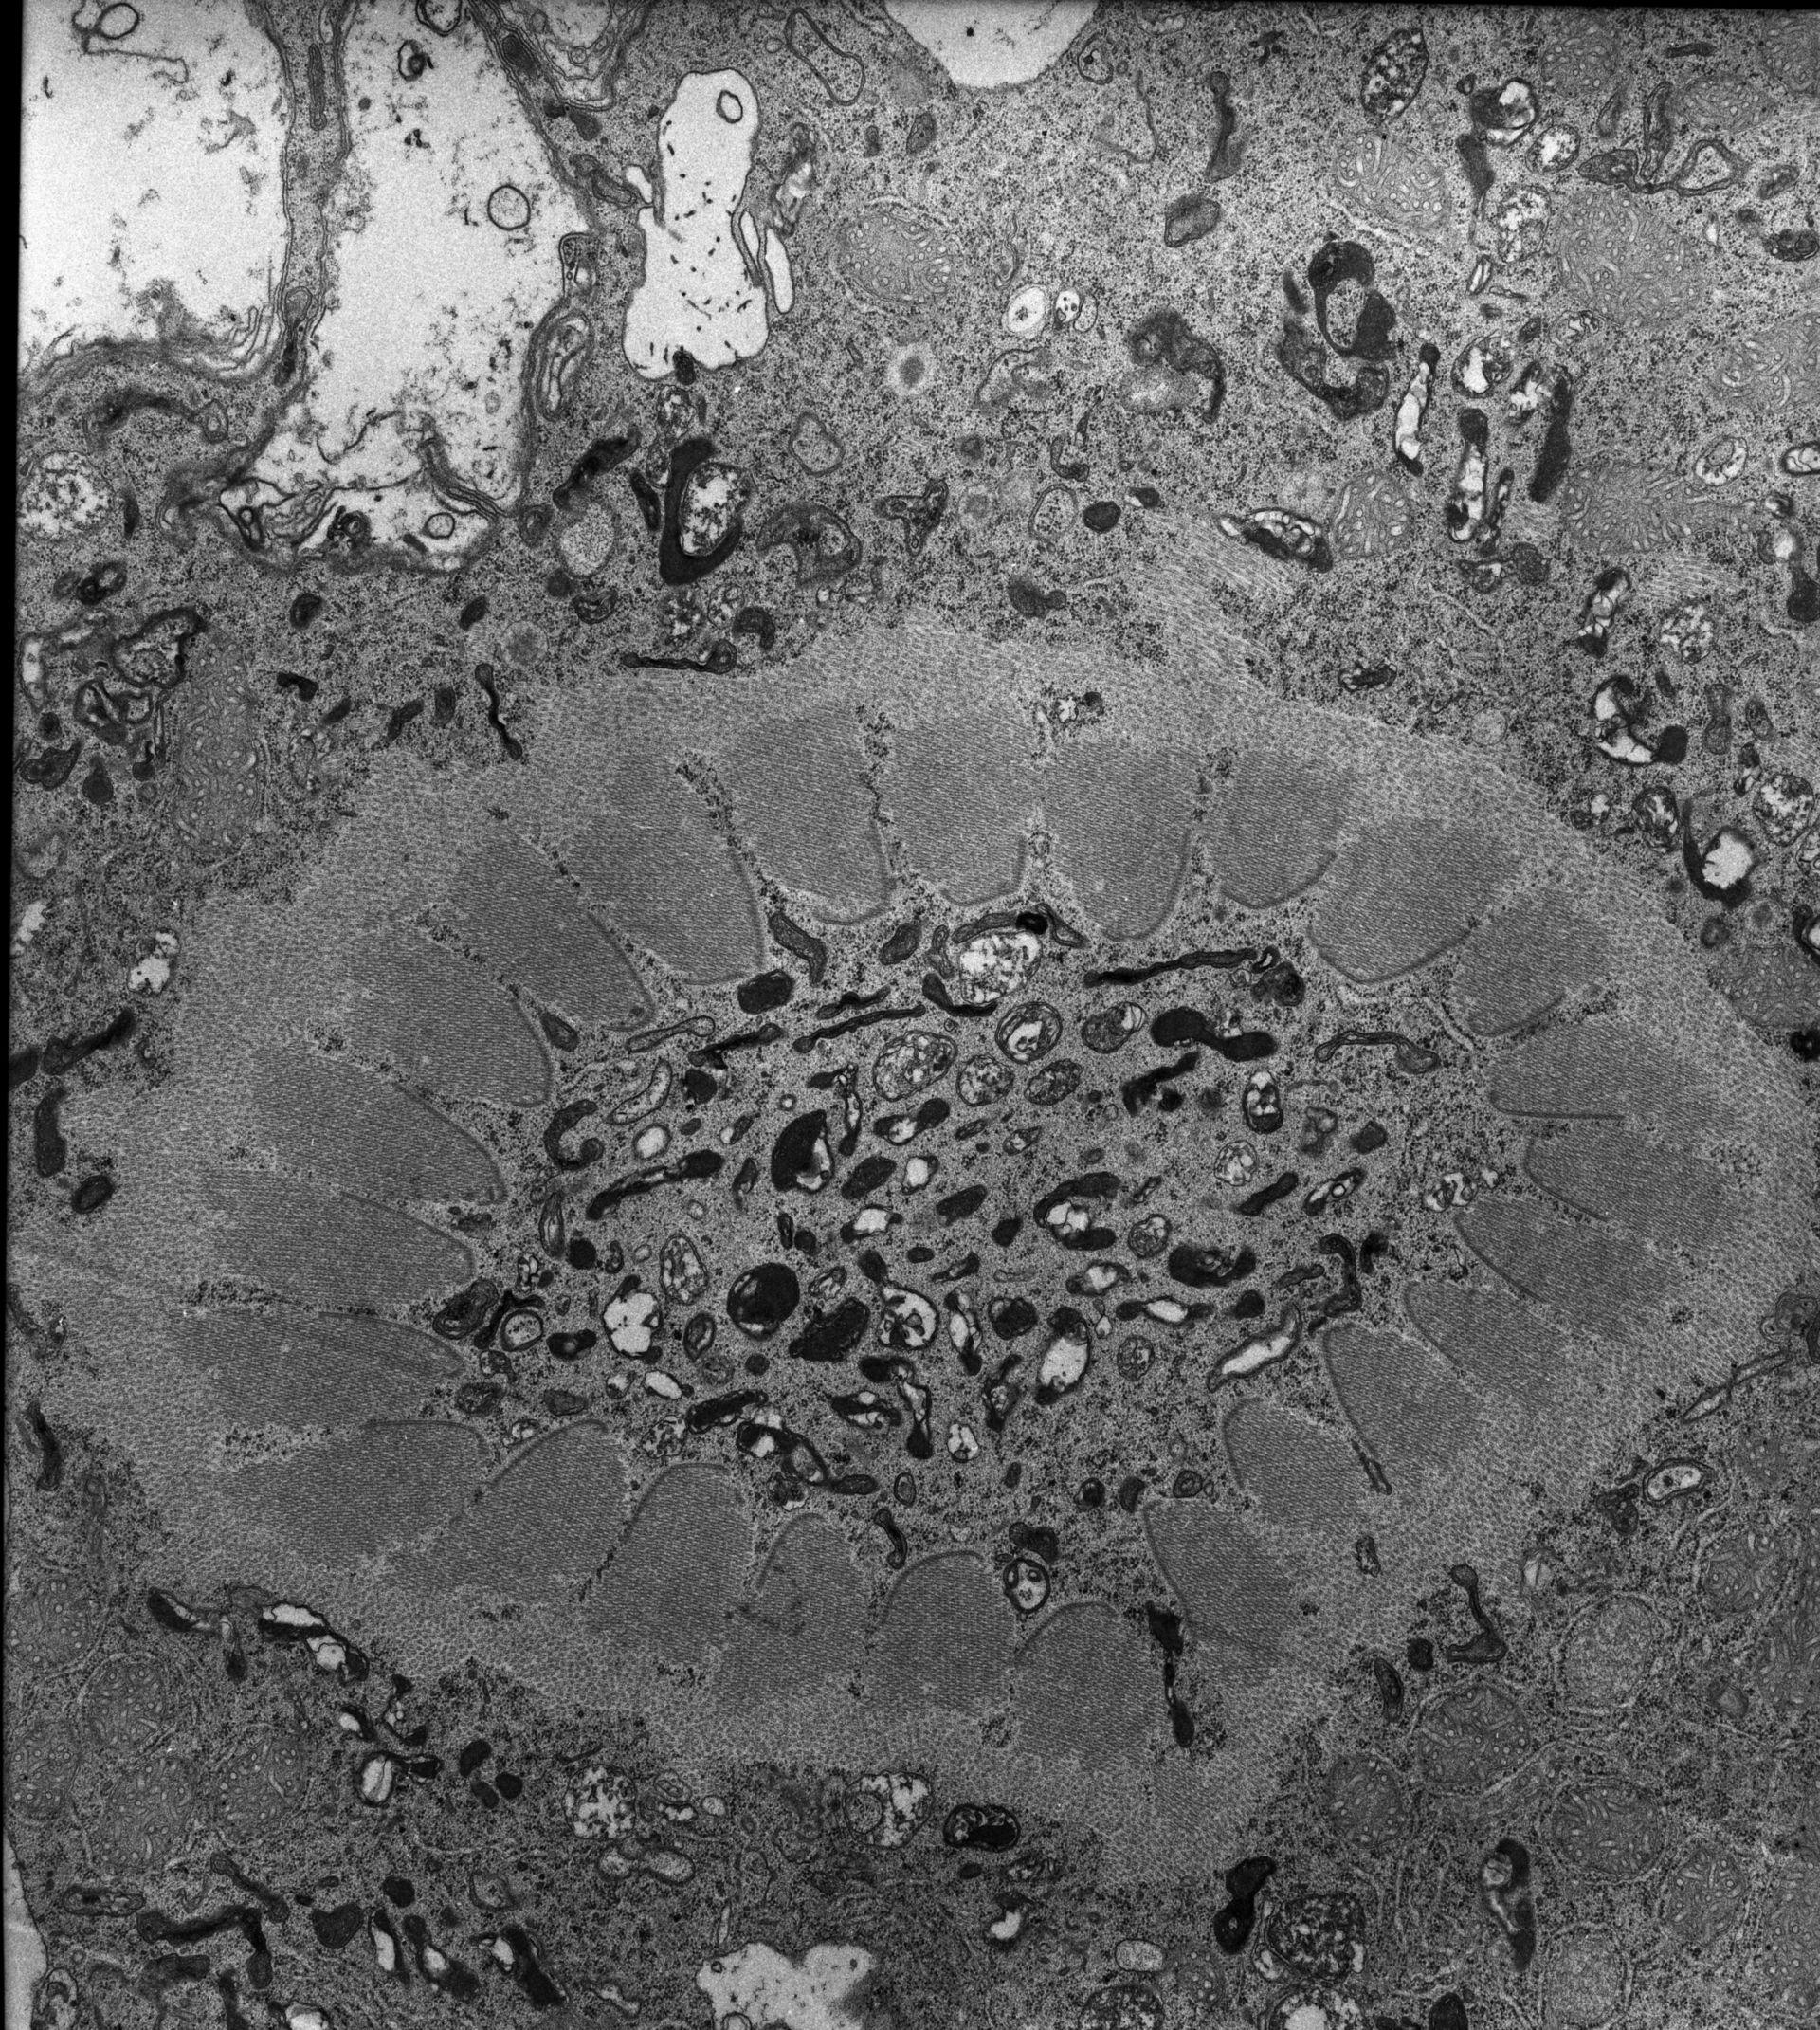 Nassula (complesso associato ai microtubuli) - CIL:7750